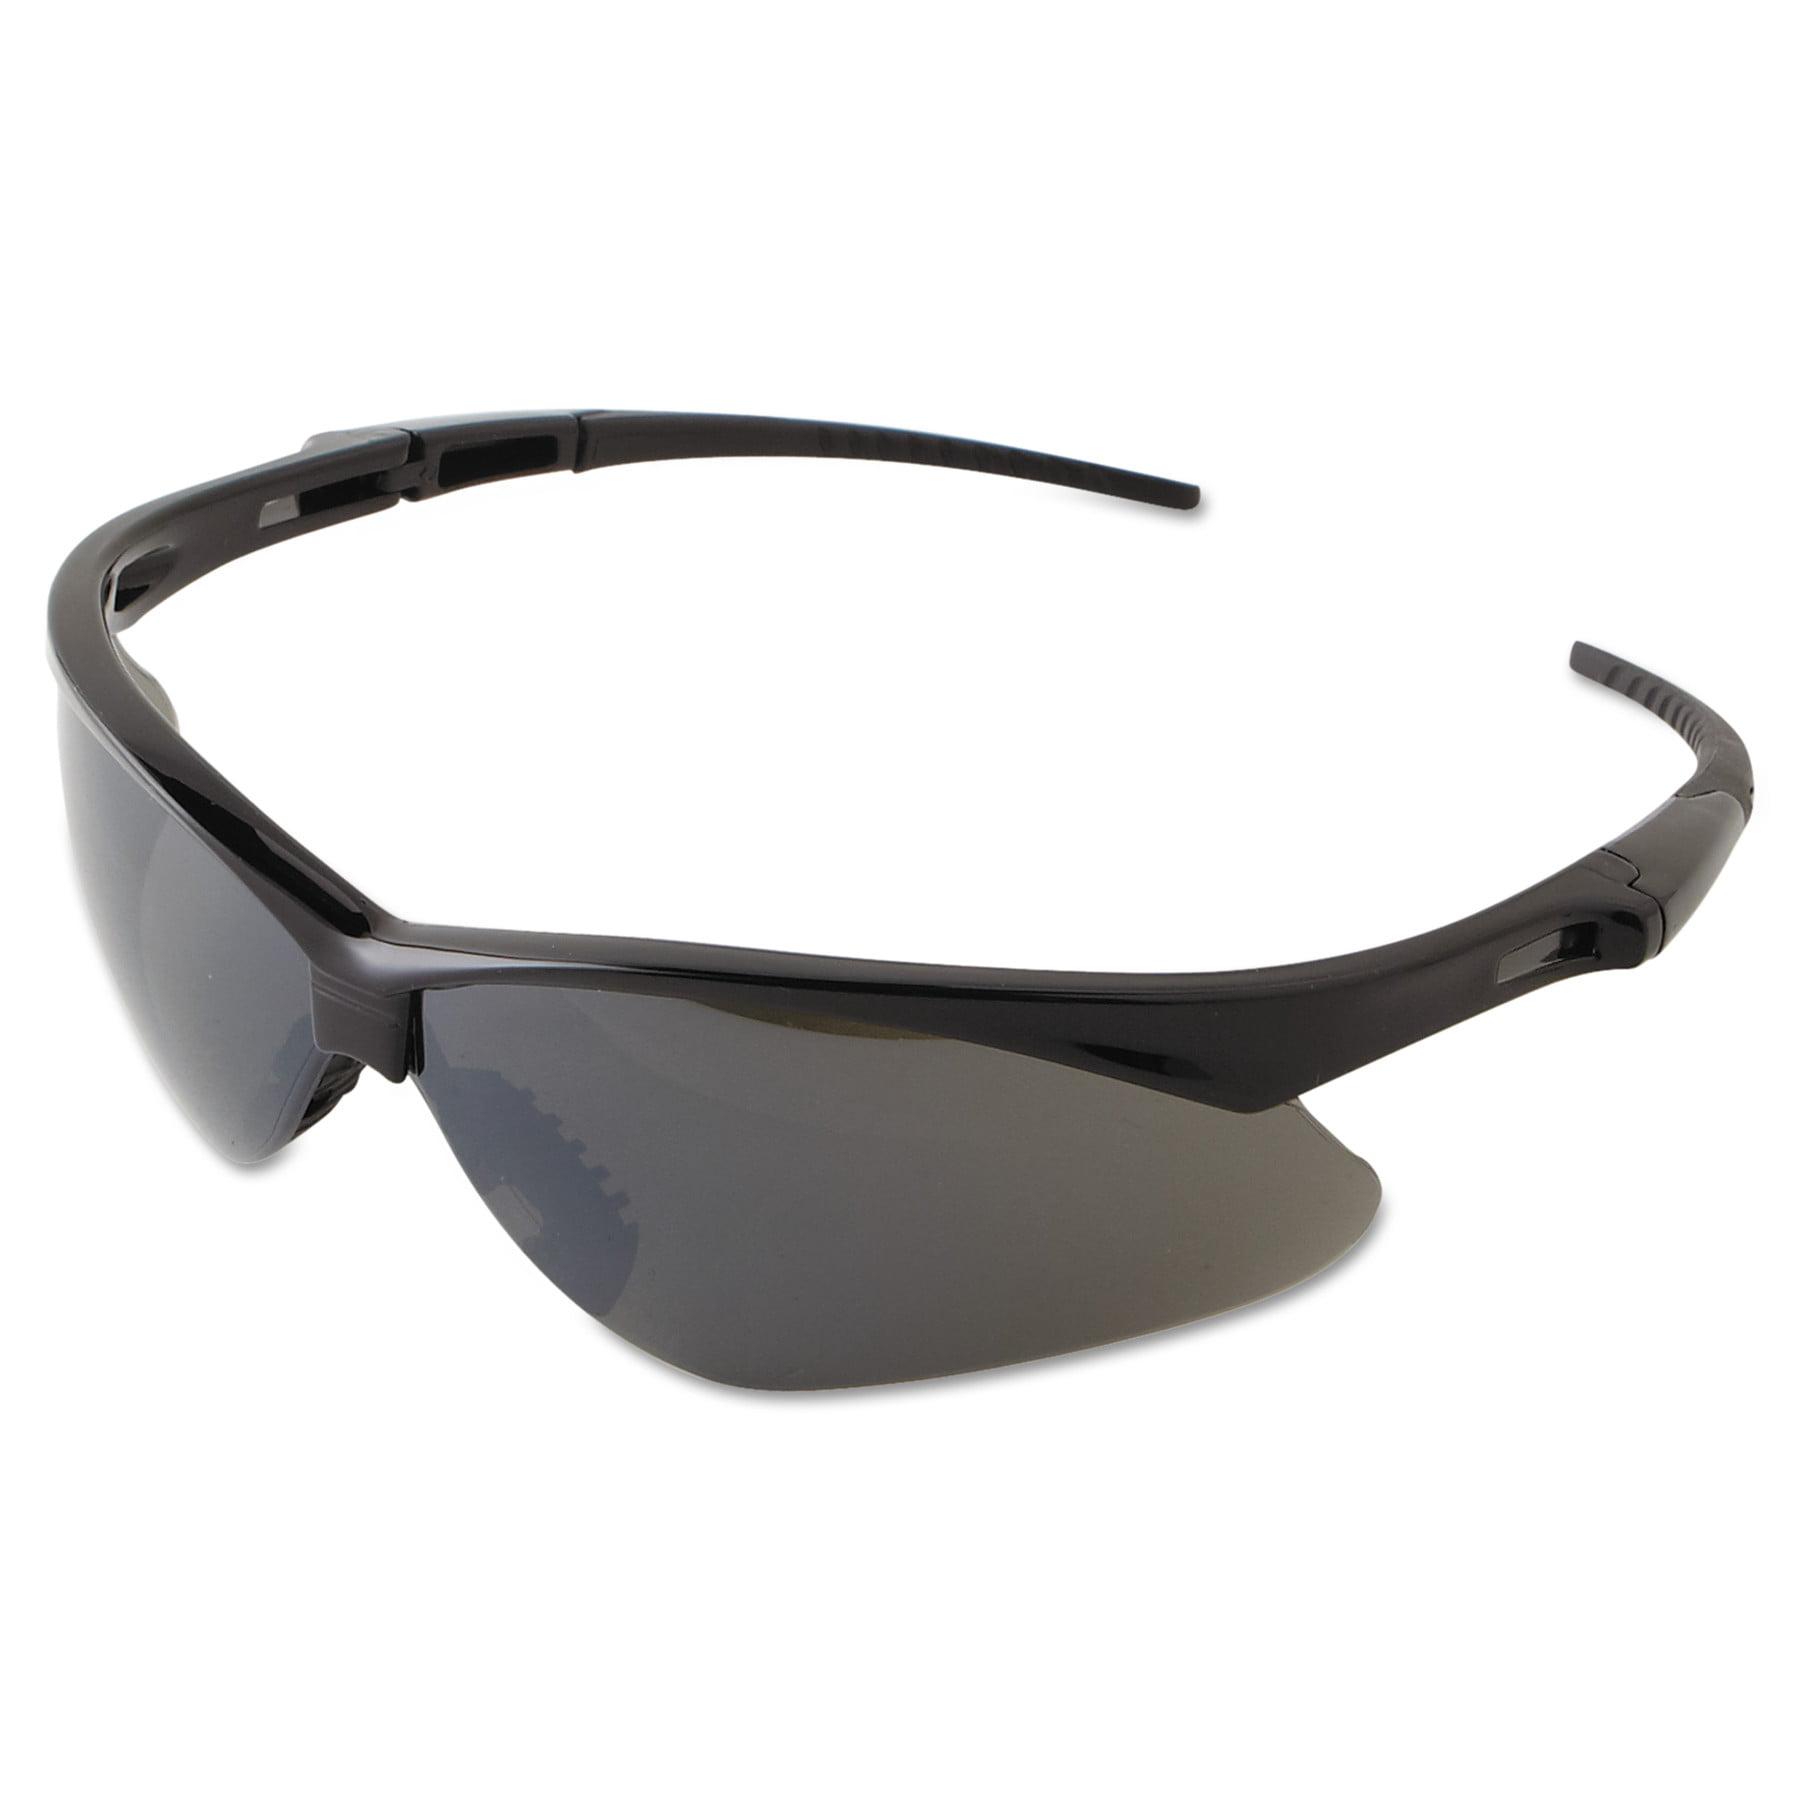 Jackson Safety* V30 NEMESIS Safety Eyewear, Black Frame, Smoke Mirror Lens by Kimberly Clark